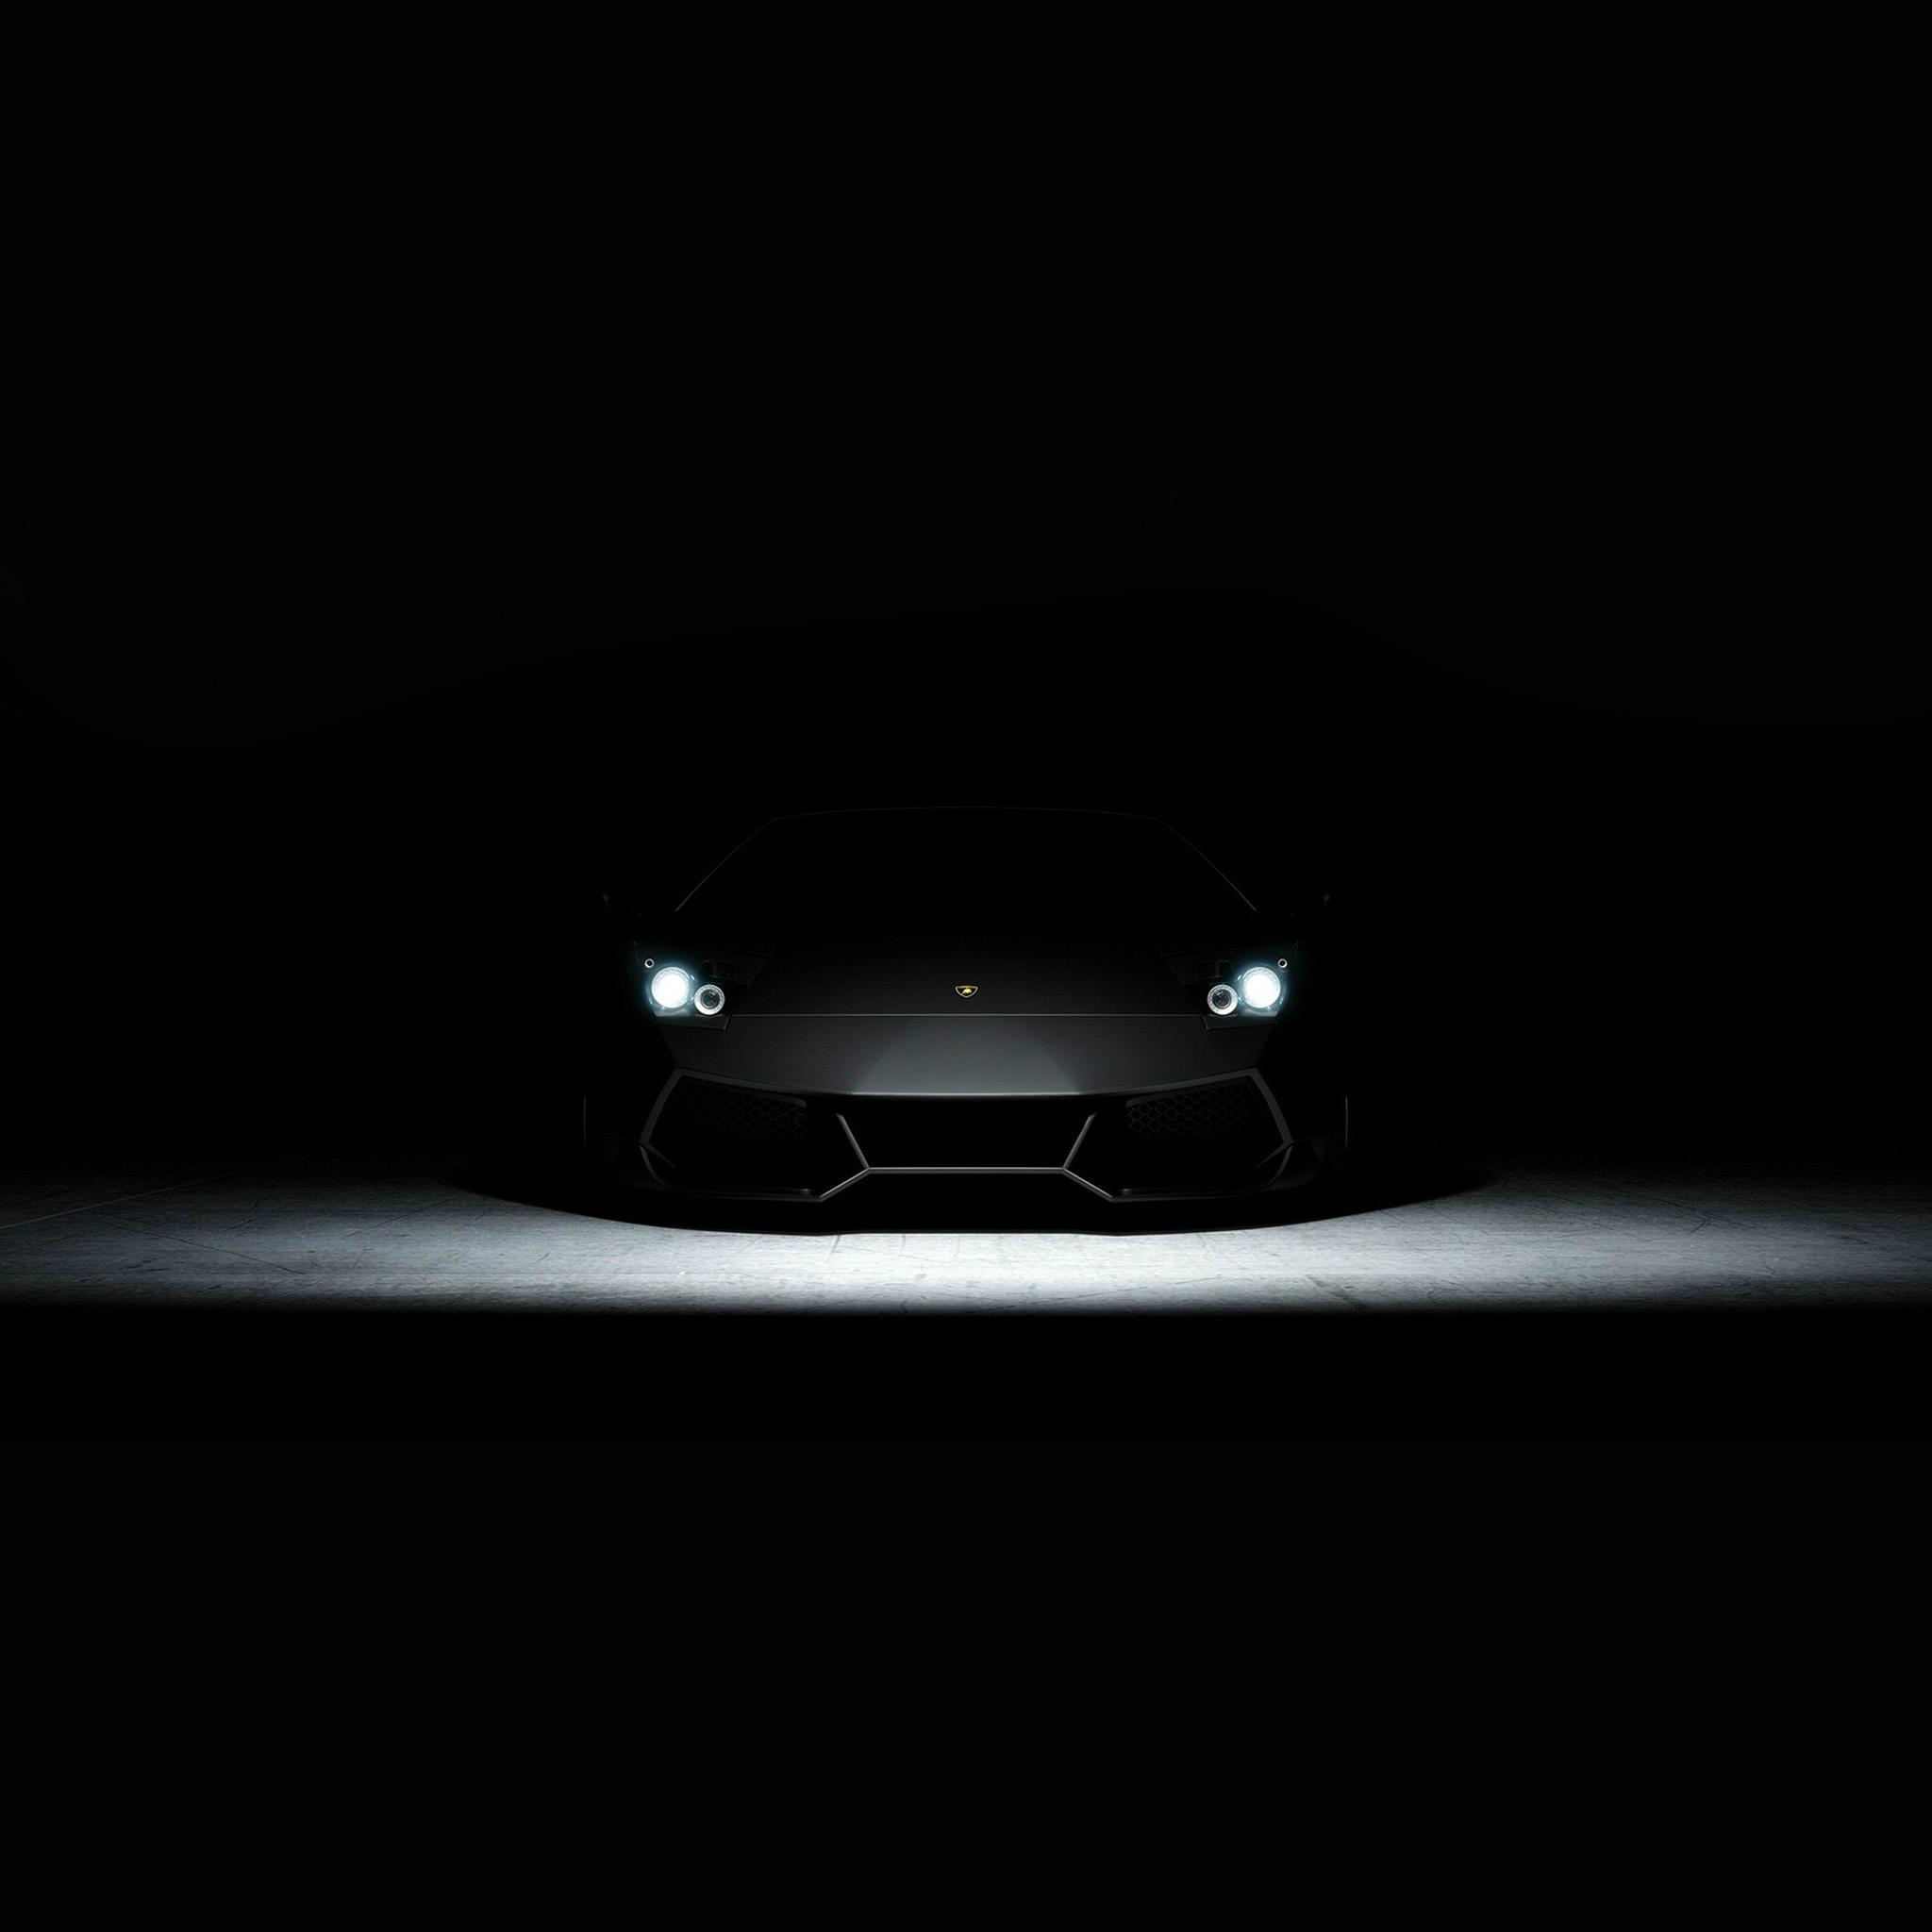 Bd23 Car Dark Lamborghini Art Illustration Wallpaper